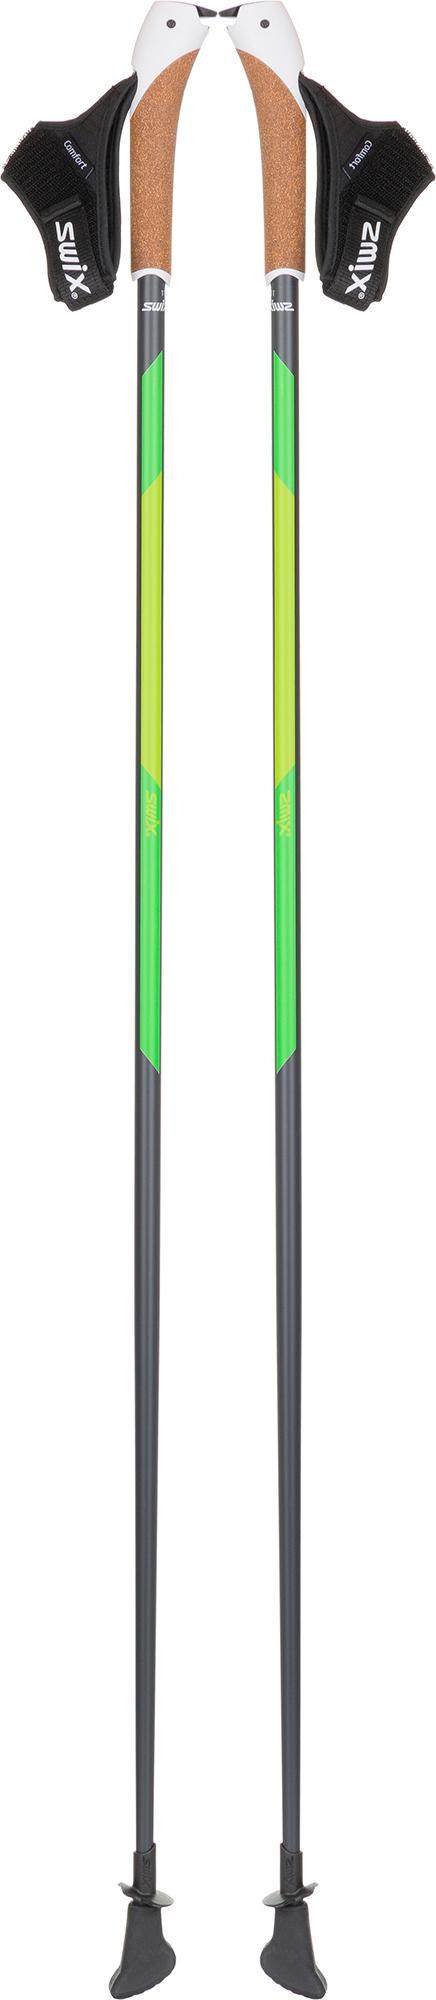 Swix Палки для скандинавской ходьбы Swix CT4